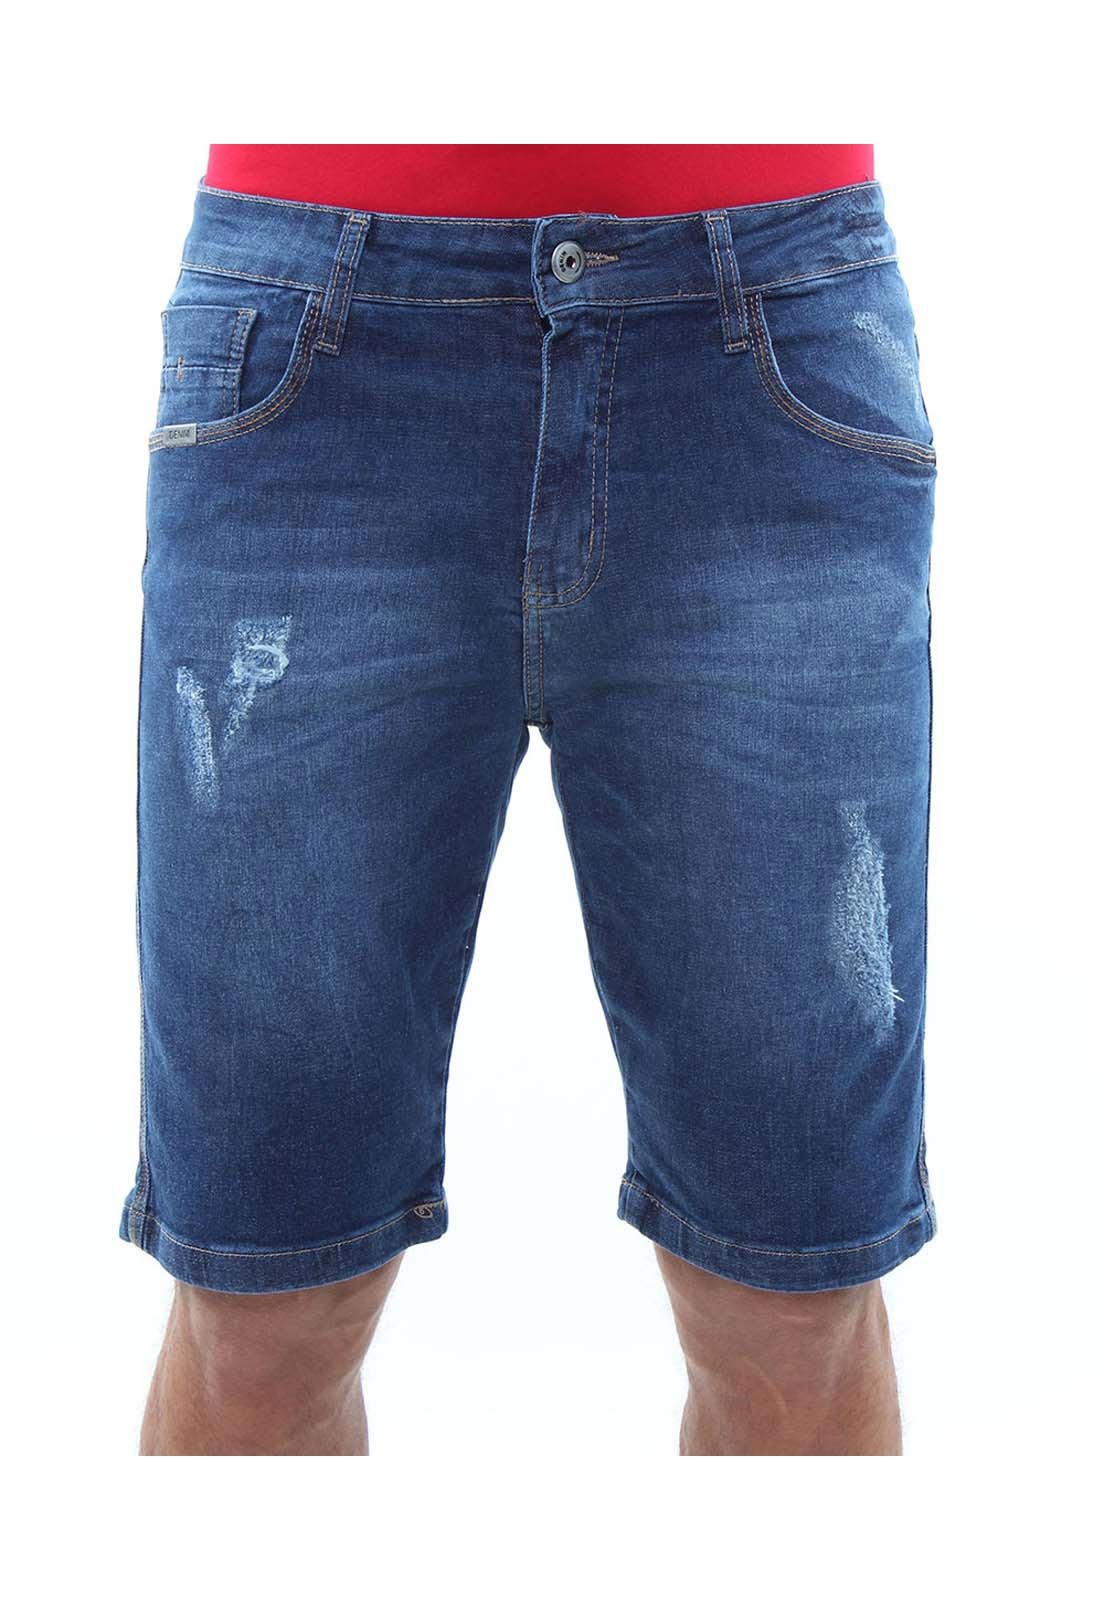 Bermuda Jeans Masculina Confort Crocker - 47792  - CROCKER JEANS